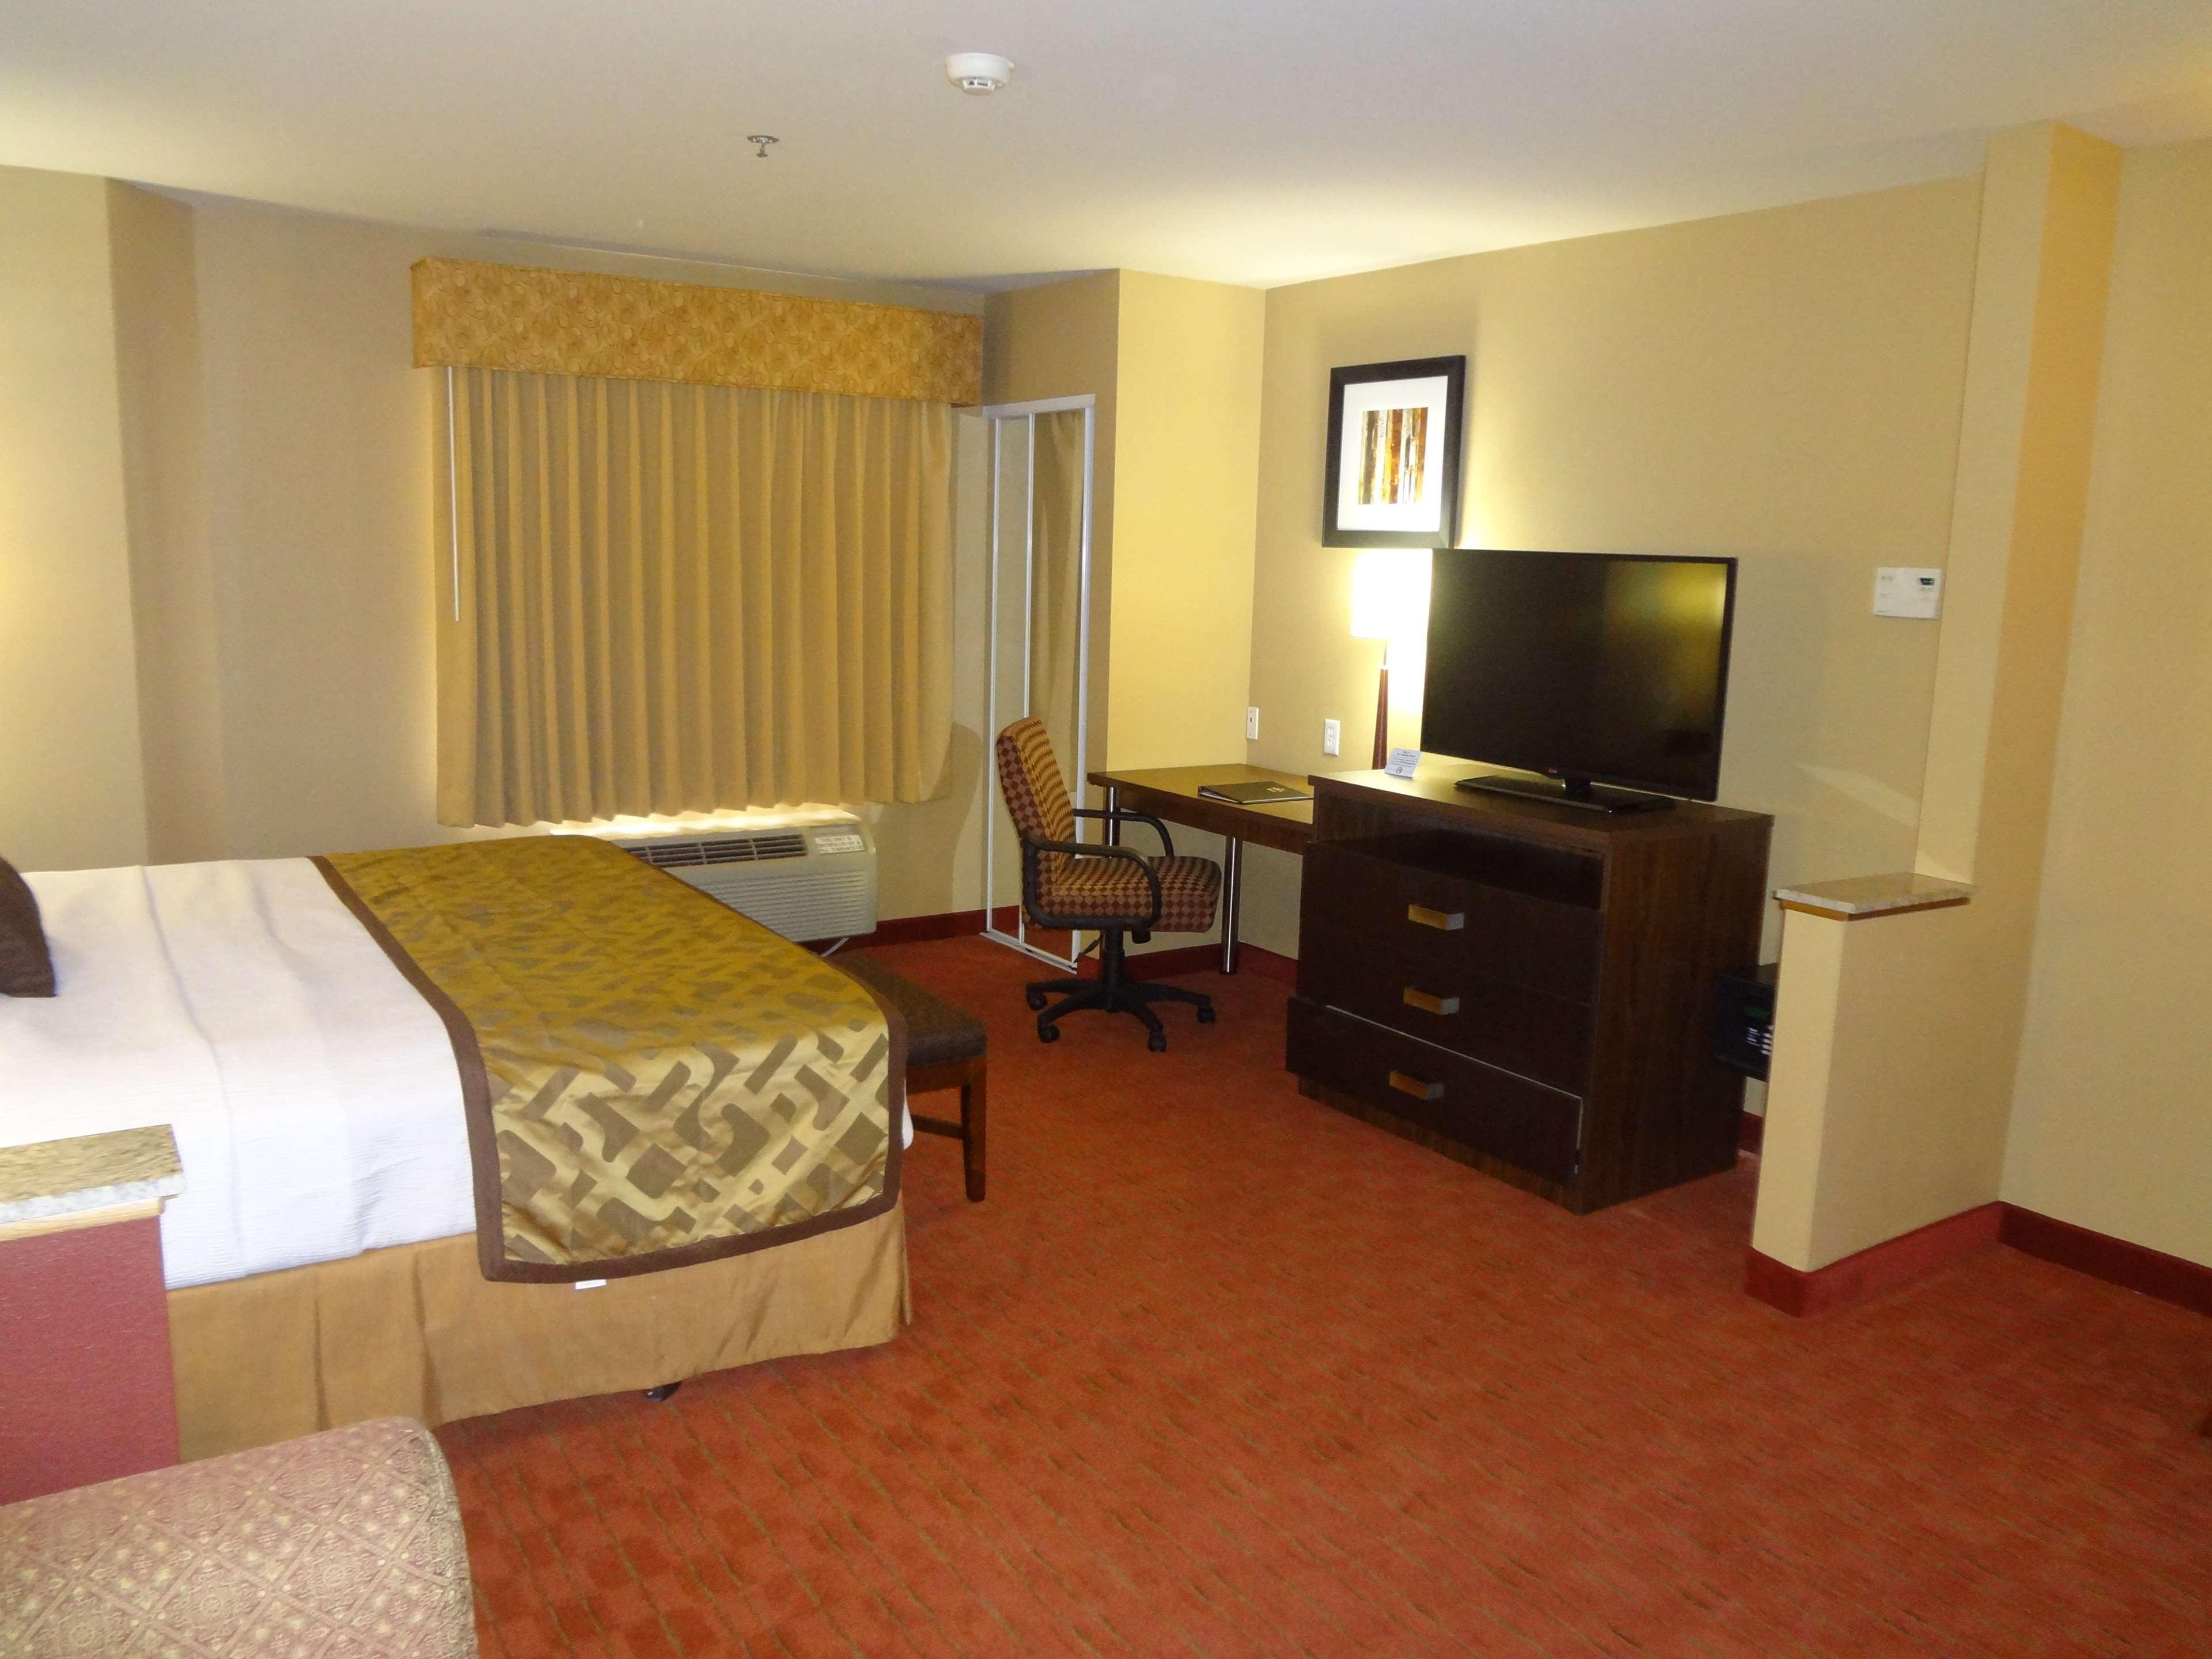 Best Western Plus Woodland Hills Hotel & Suites image 28